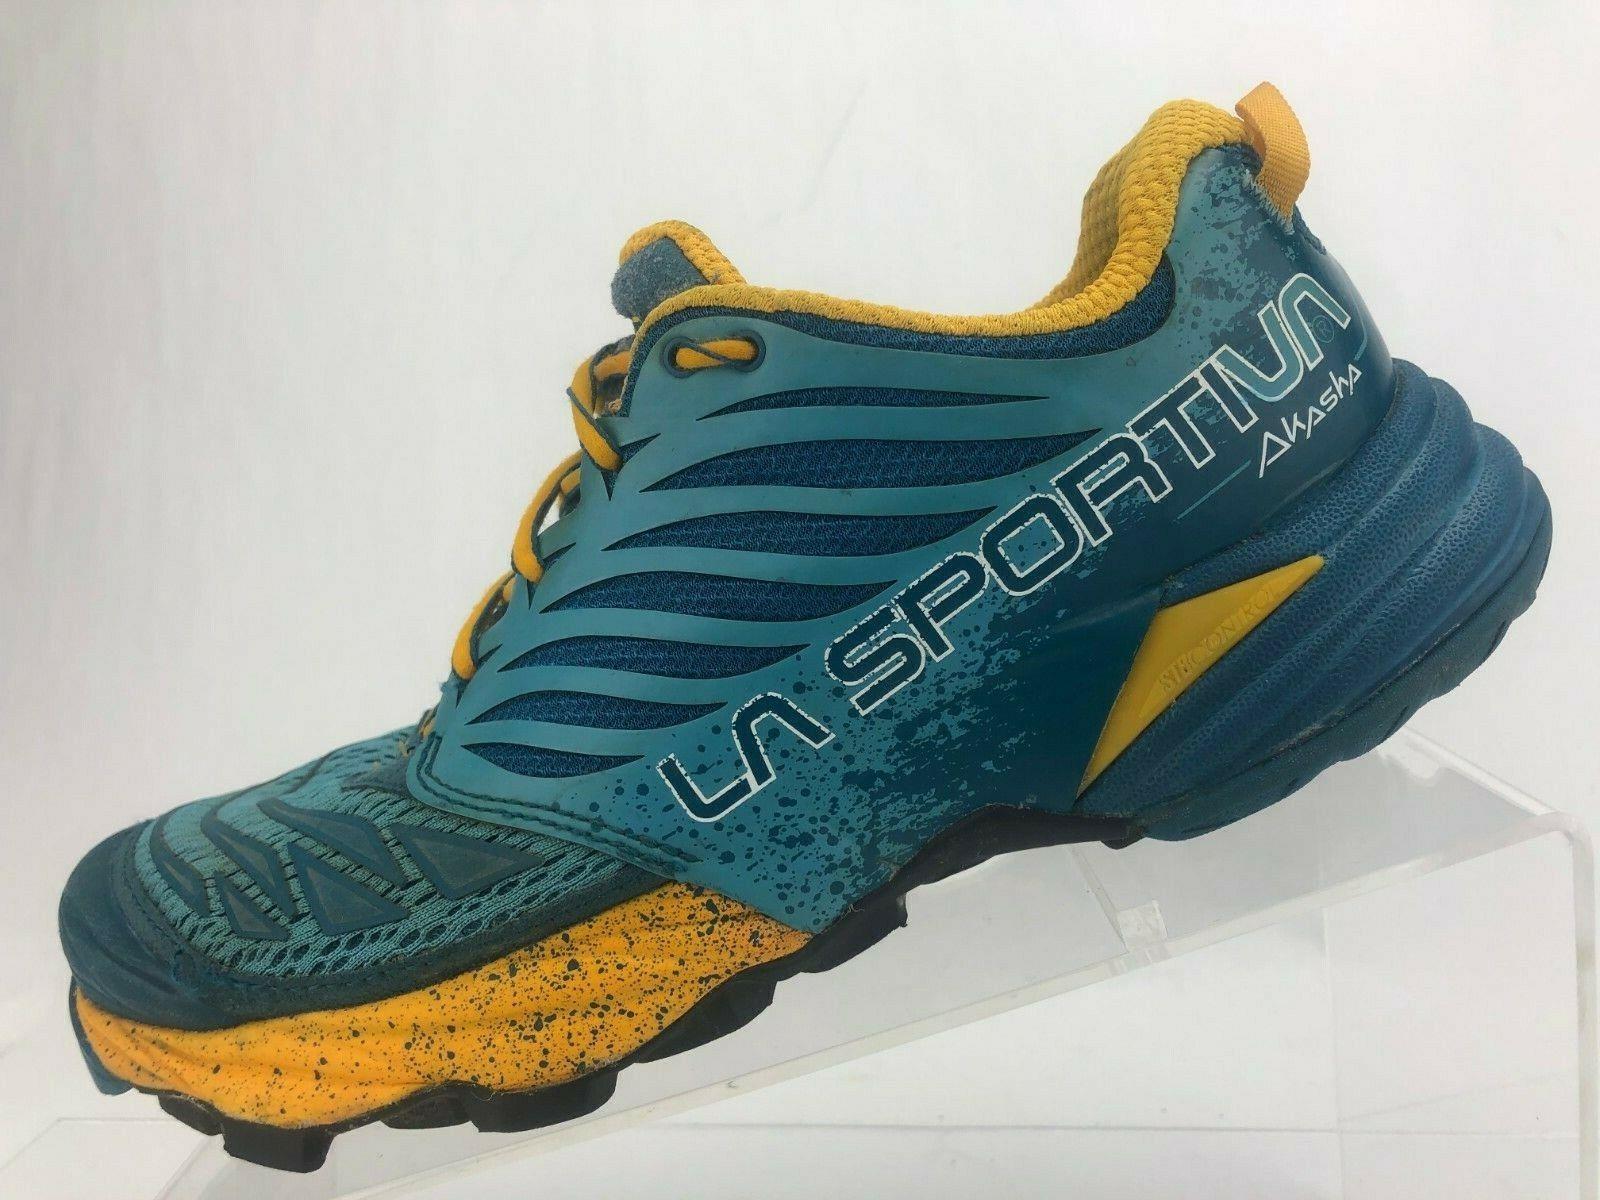 La Sportiva Akasha Montaña Zapatillas Azul Amarillo Ortholite Mujer EE. UU. 8.5